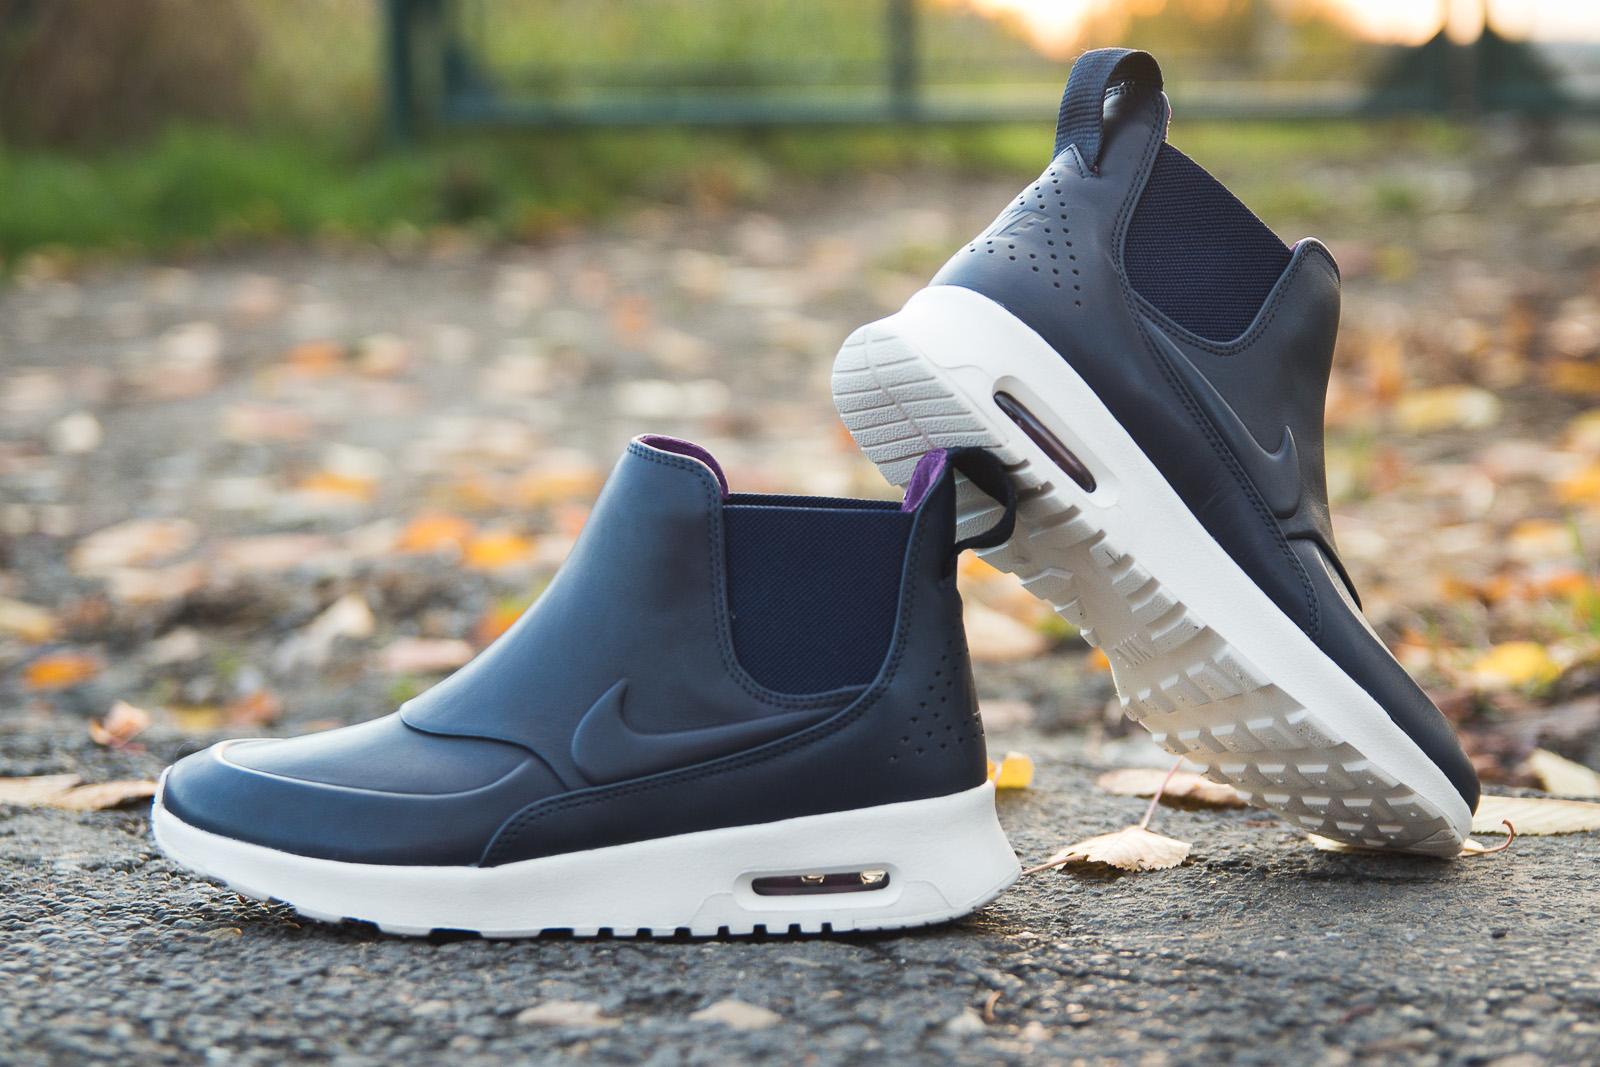 Novinka od Nike: Nike Air Max Thea Mid